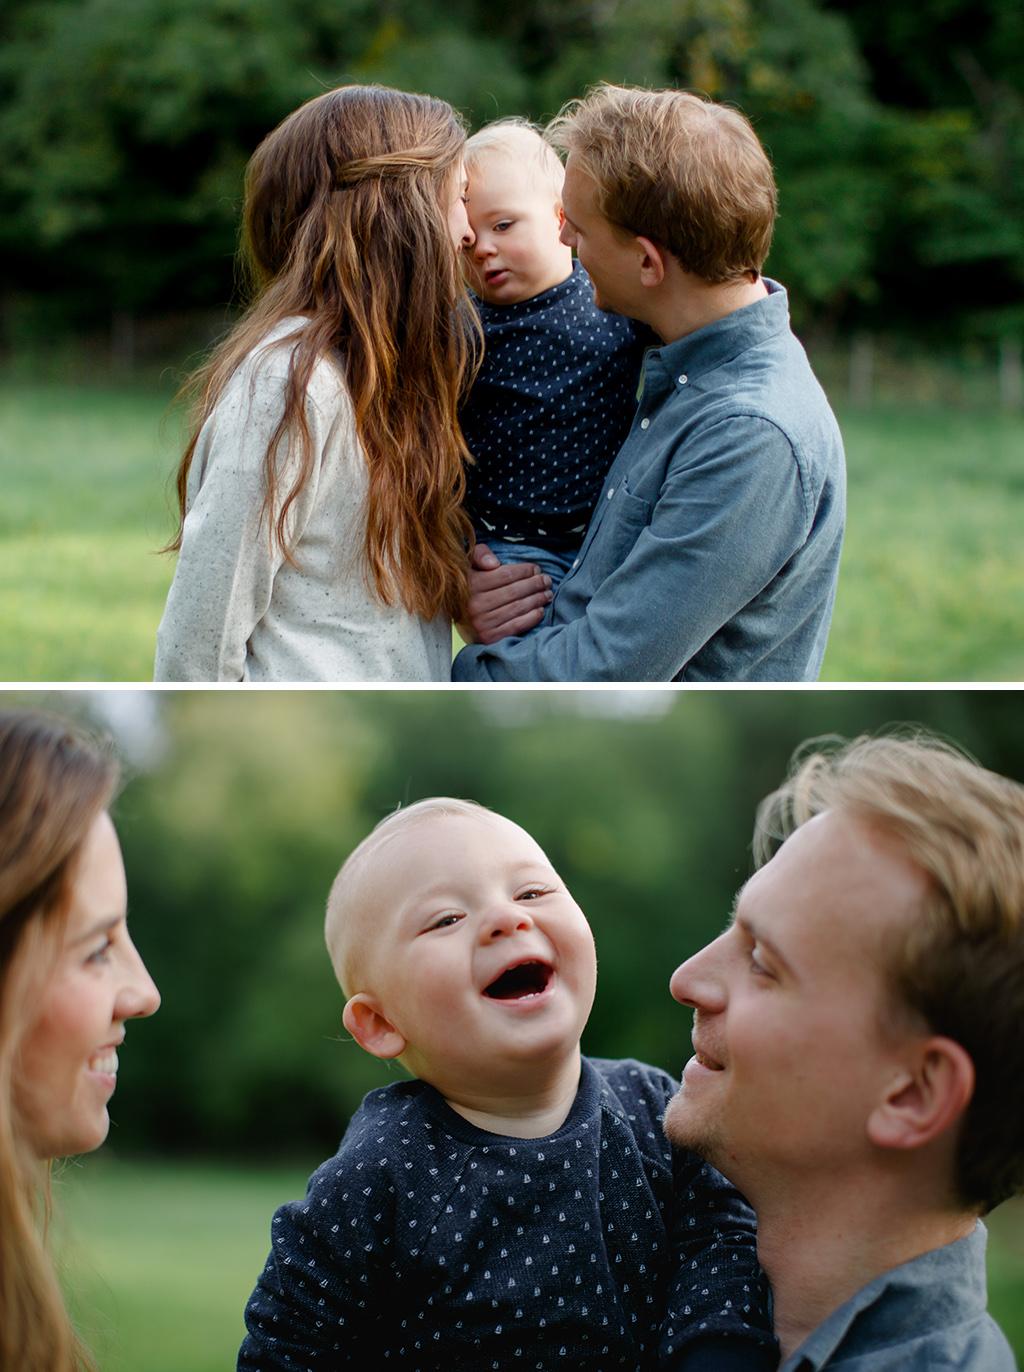 Familjefotografering_Stockholm_Familjefotograf-Anna-Sandstrom_4.jpg